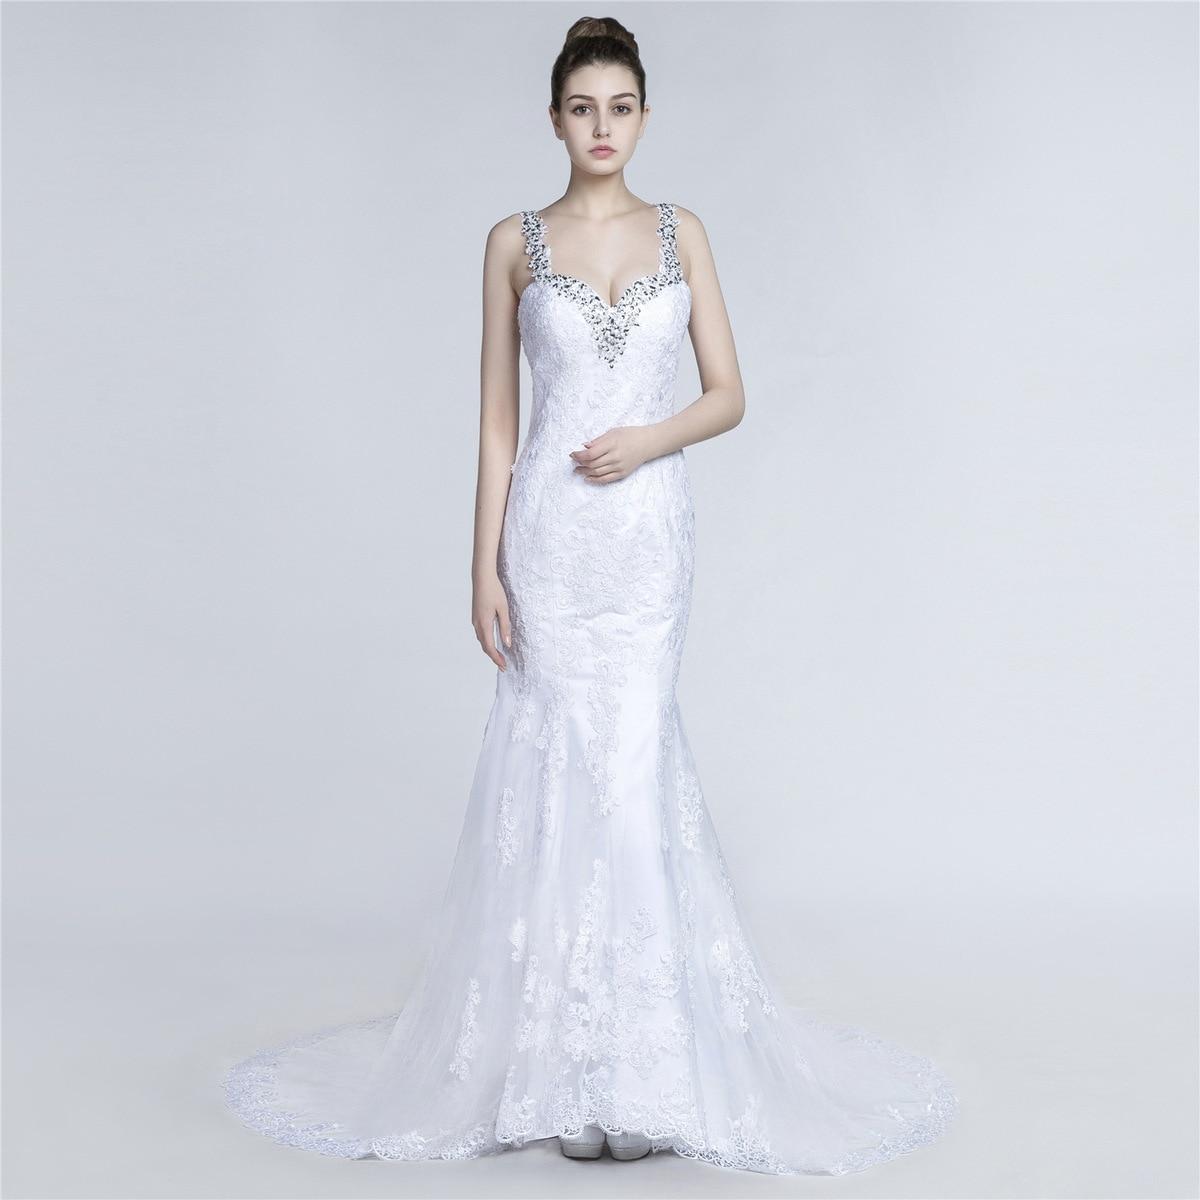 Sweetheart Mermaid Wedding Gown: 2018 New Sexy Sweetheart Mermaid Wedding Dresses Applique